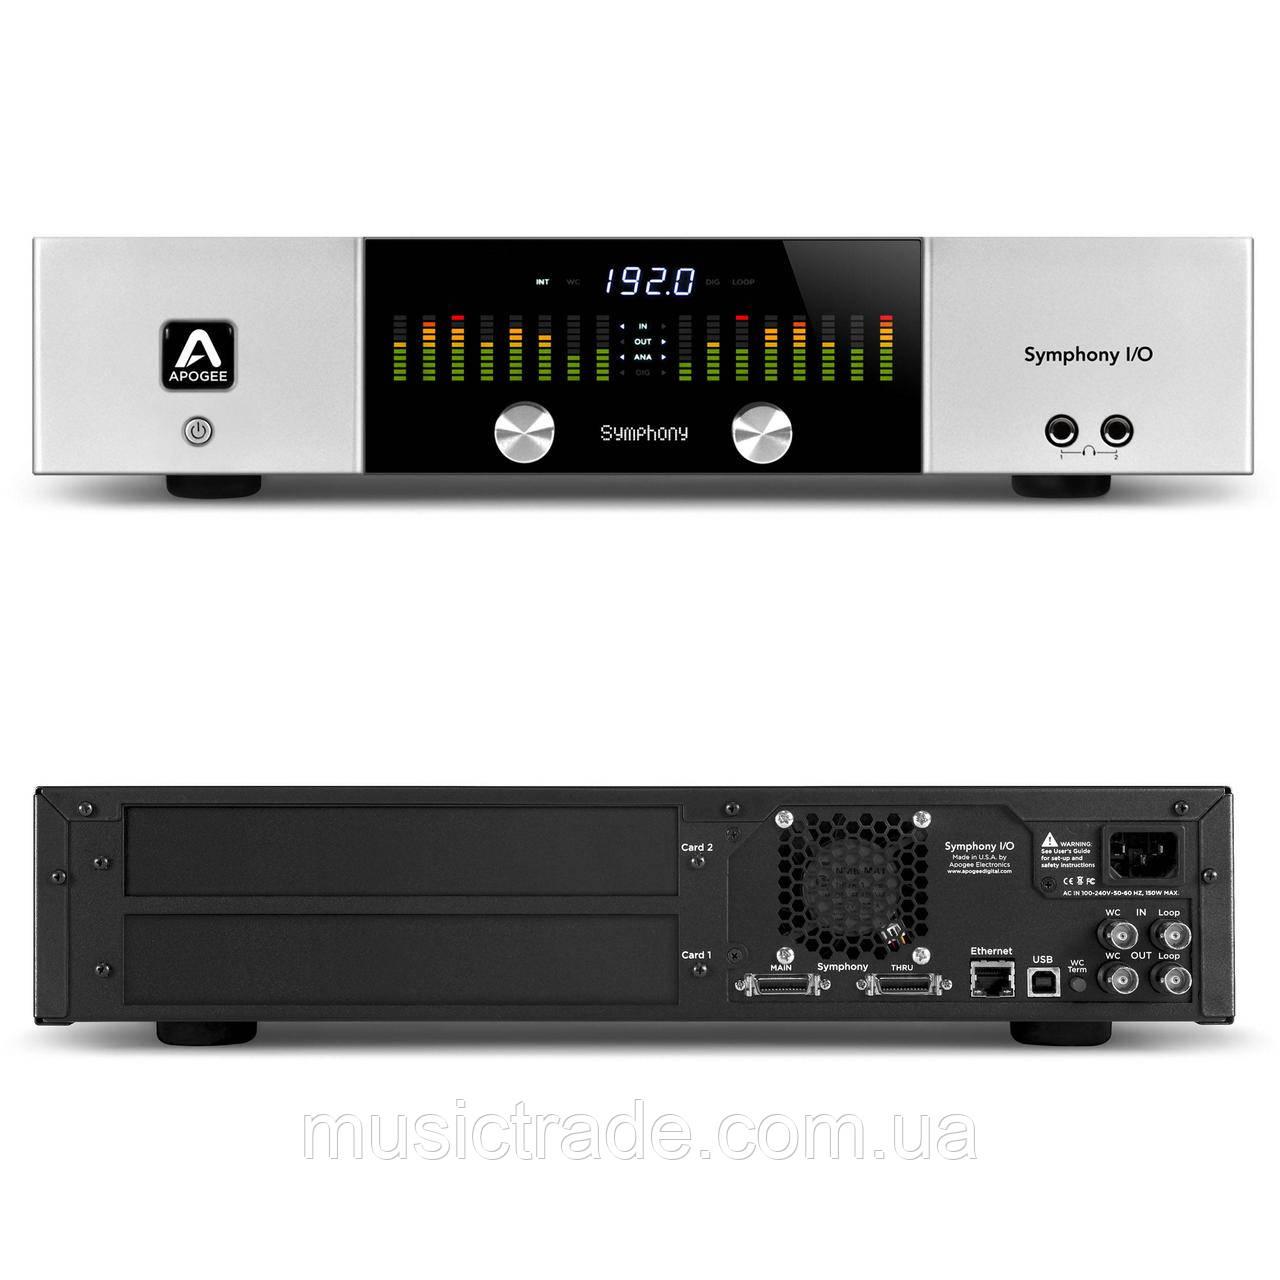 Аудиоинтерфейс Apogee Symphony I/O (chassis)